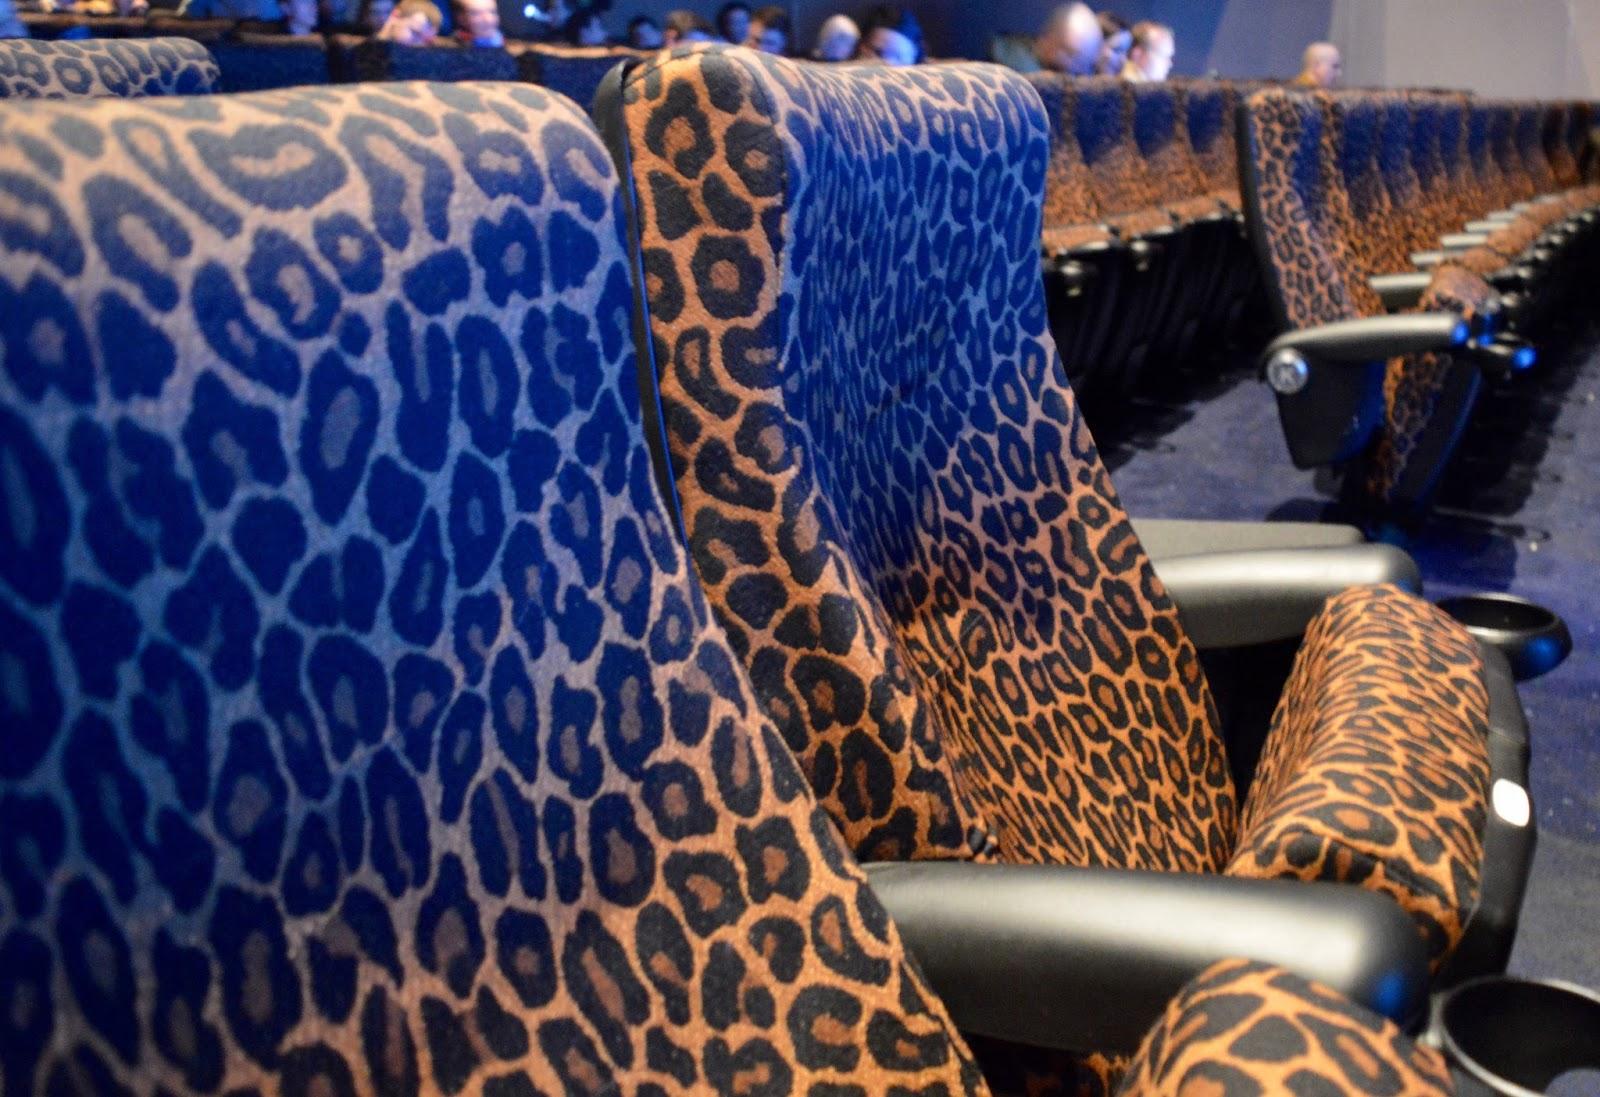 Leopard print cinema seats